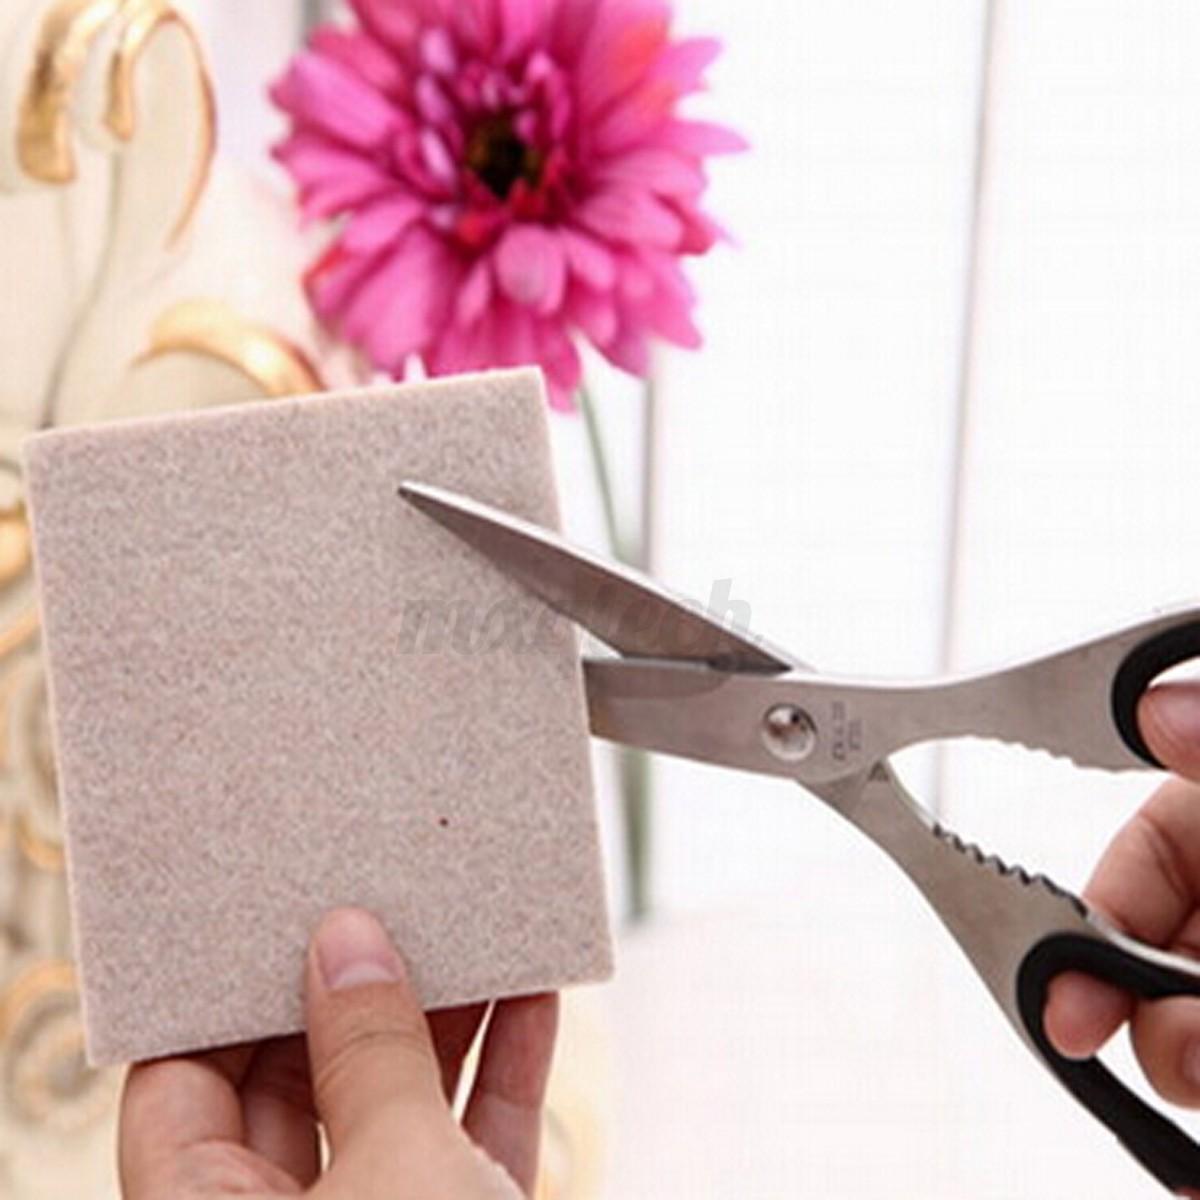 1 2 5 Pcs 15x11cm Self Adhesive Anti Skid Floor Protectors